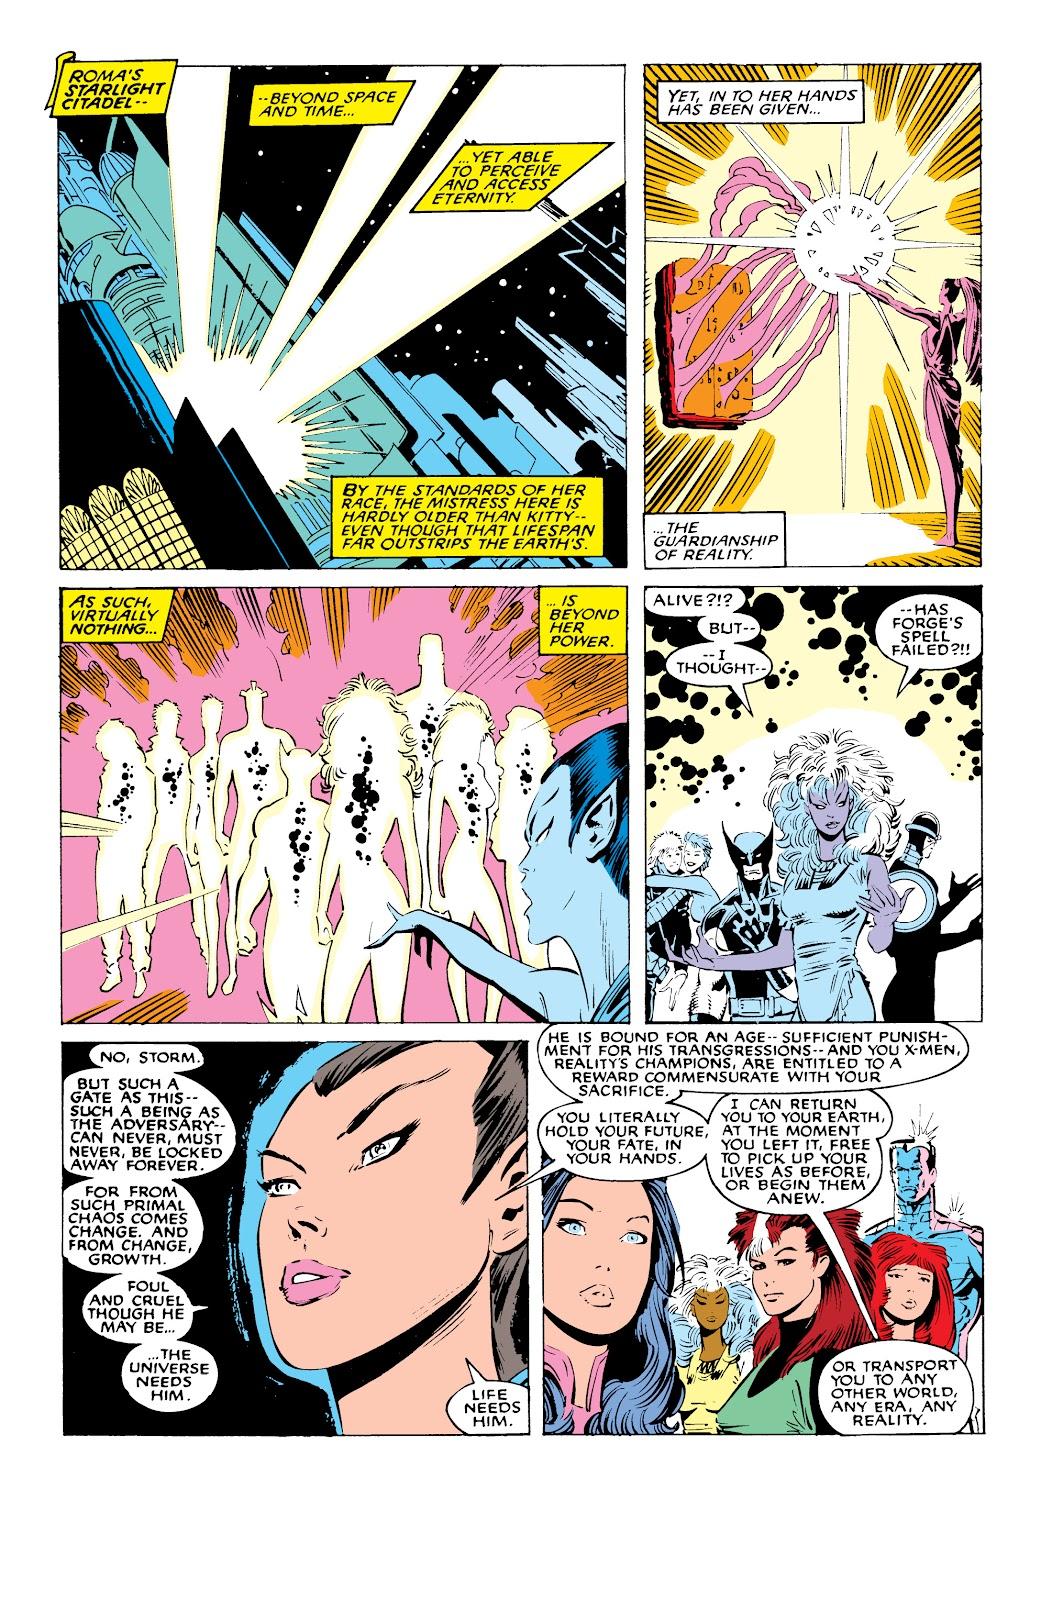 Read online X-Men Milestones: Fall of the Mutants comic -  Issue # TPB (Part 1) - 89